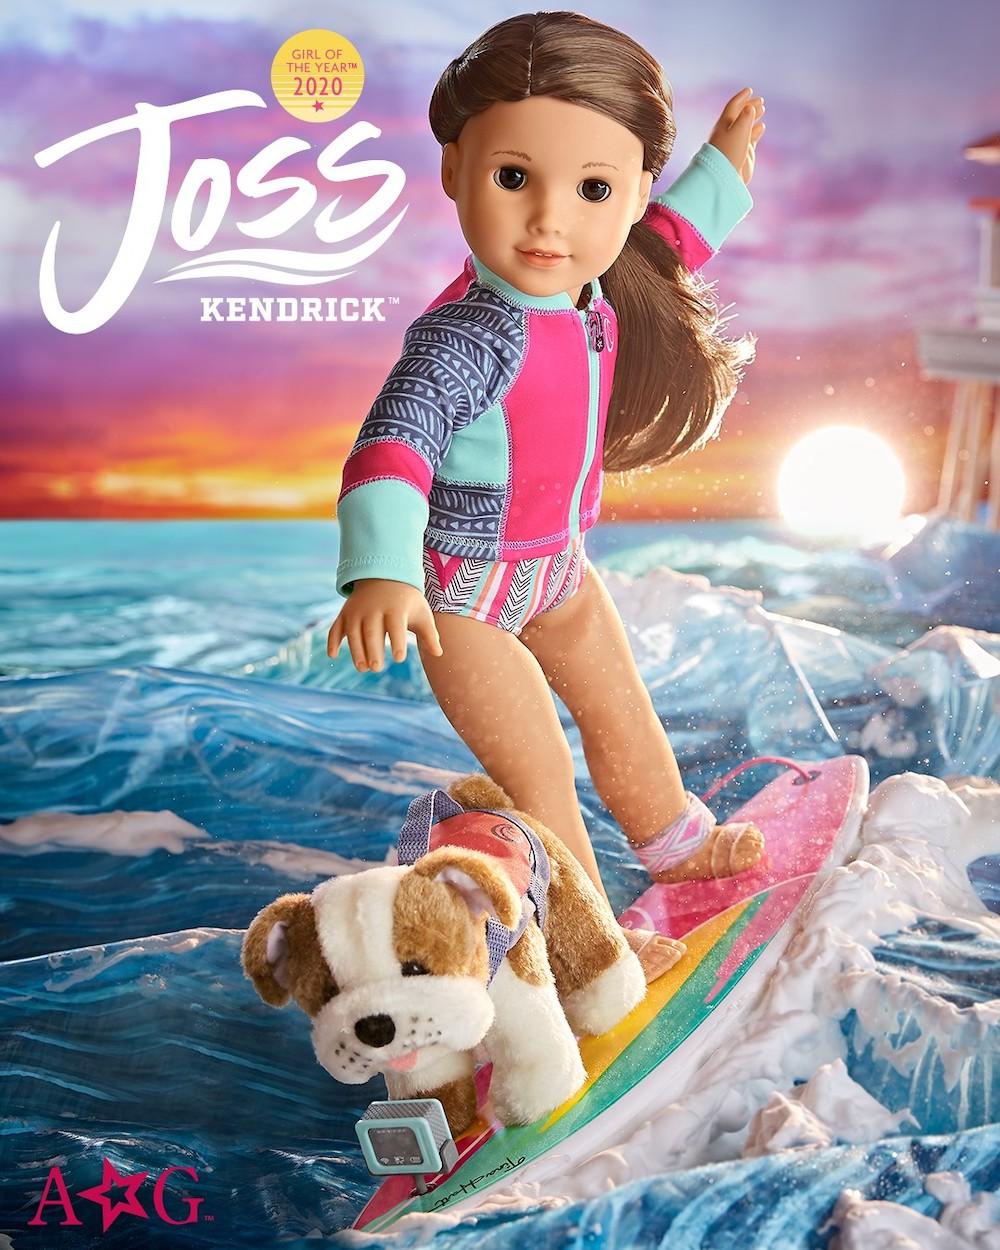 Joss Kendrick, American Girl 2020 Girl of the Year